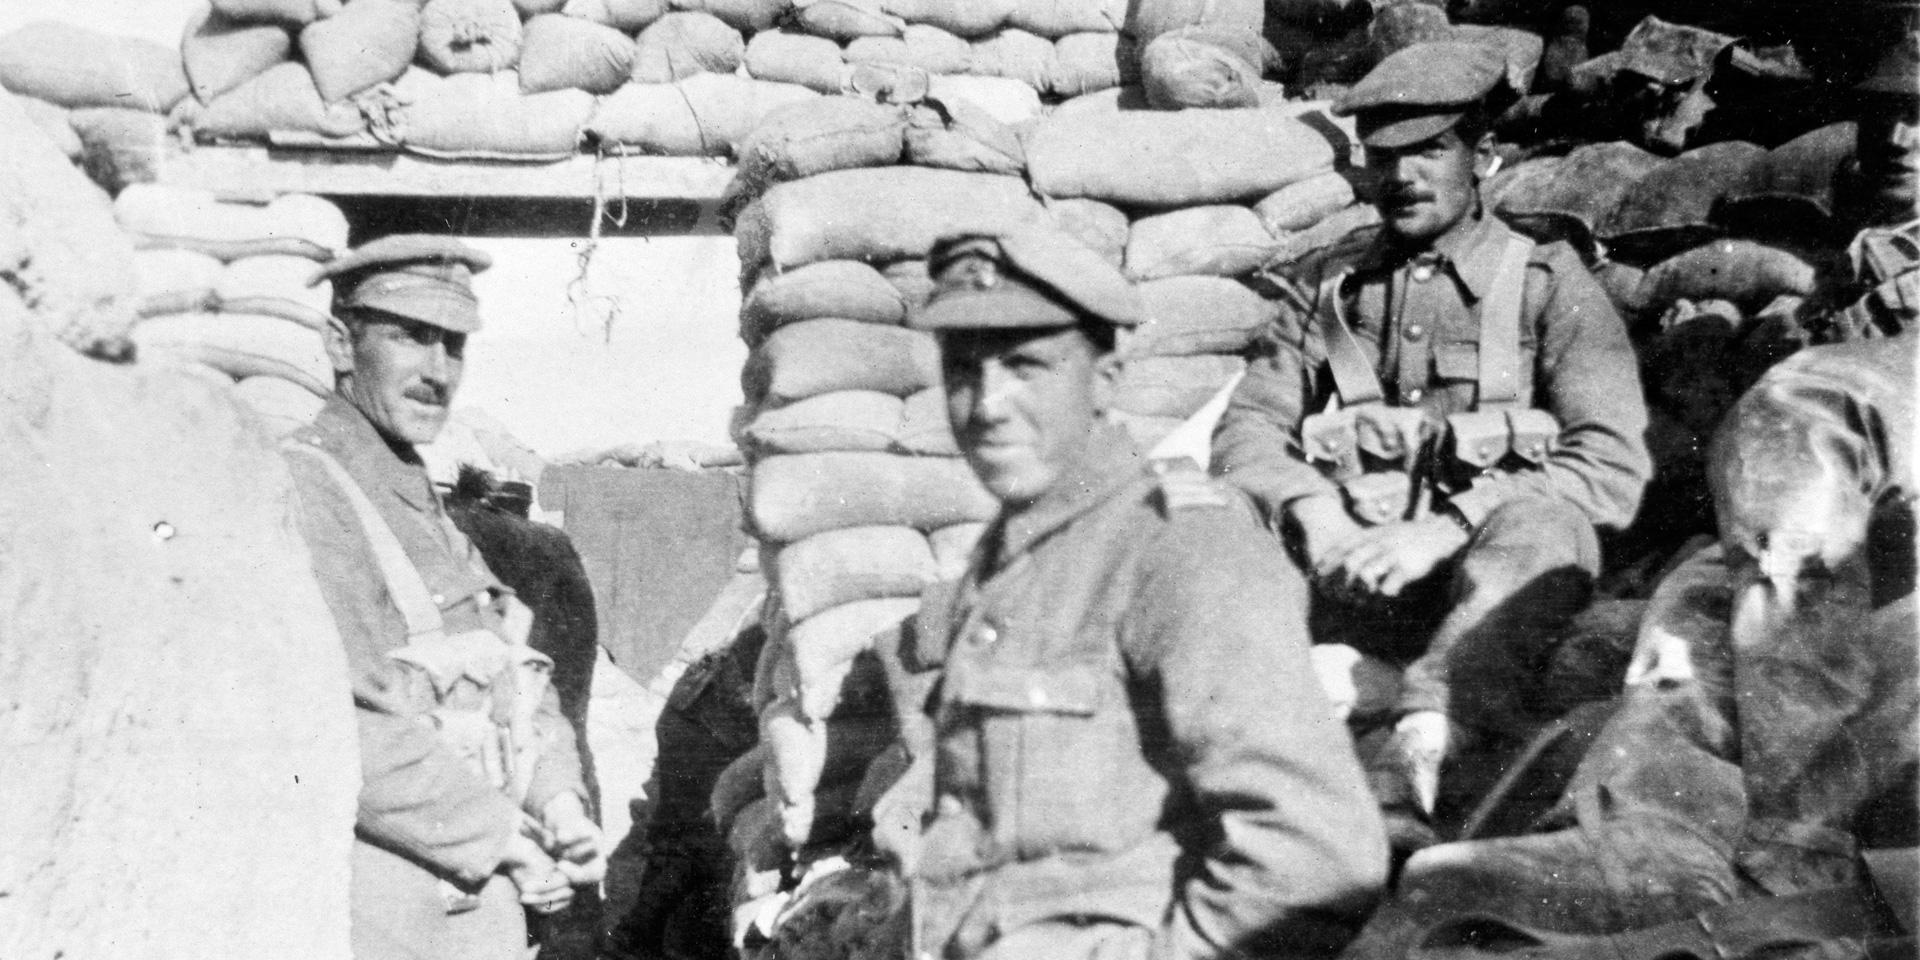 'Xmas Day 1915. Dardanelles', 1915